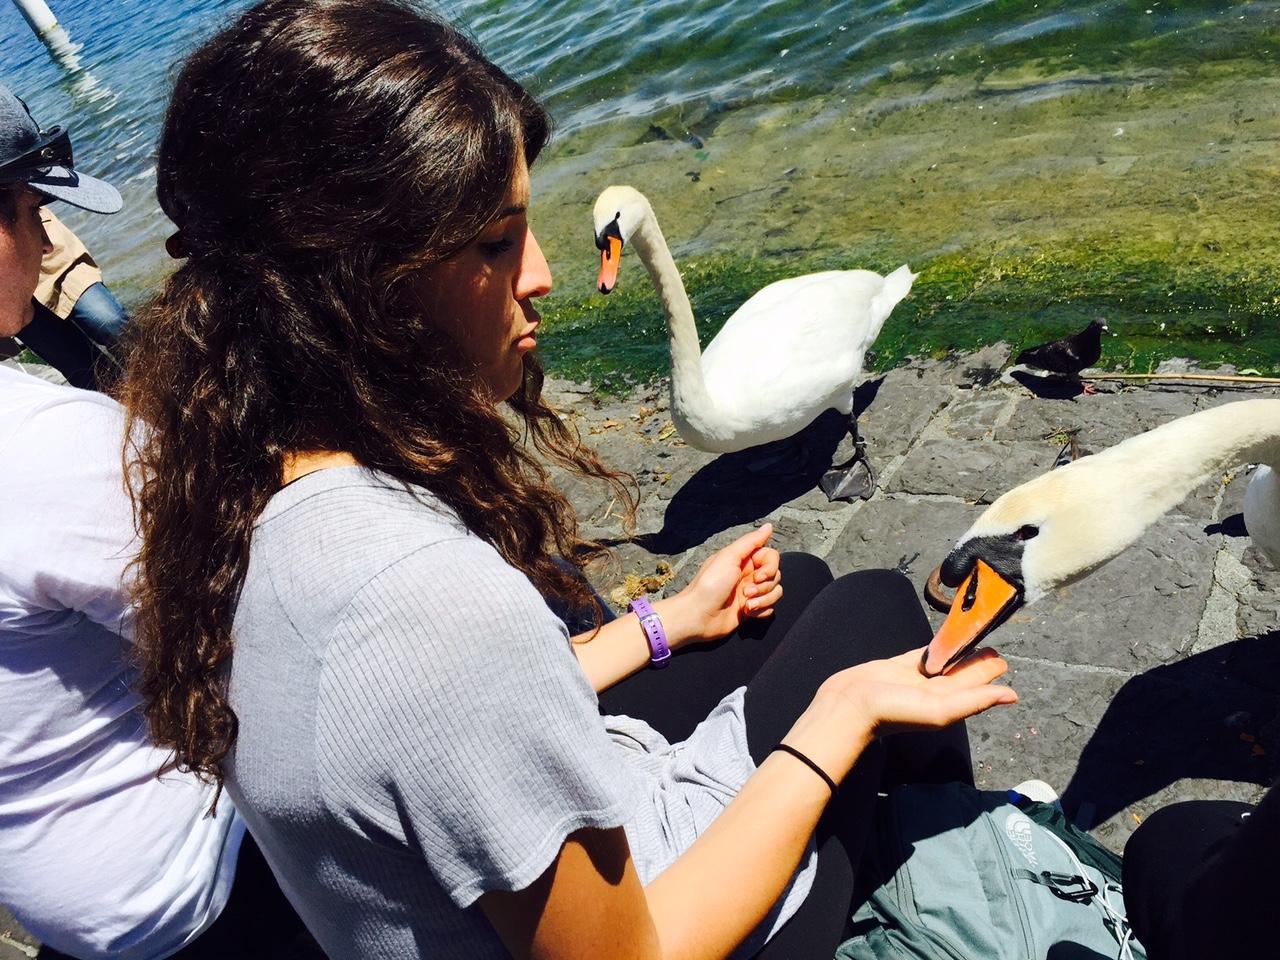 Sarah Johnson aus Texas kennt keine Berührungsängste: «Das sind Königsvögel, oder?»